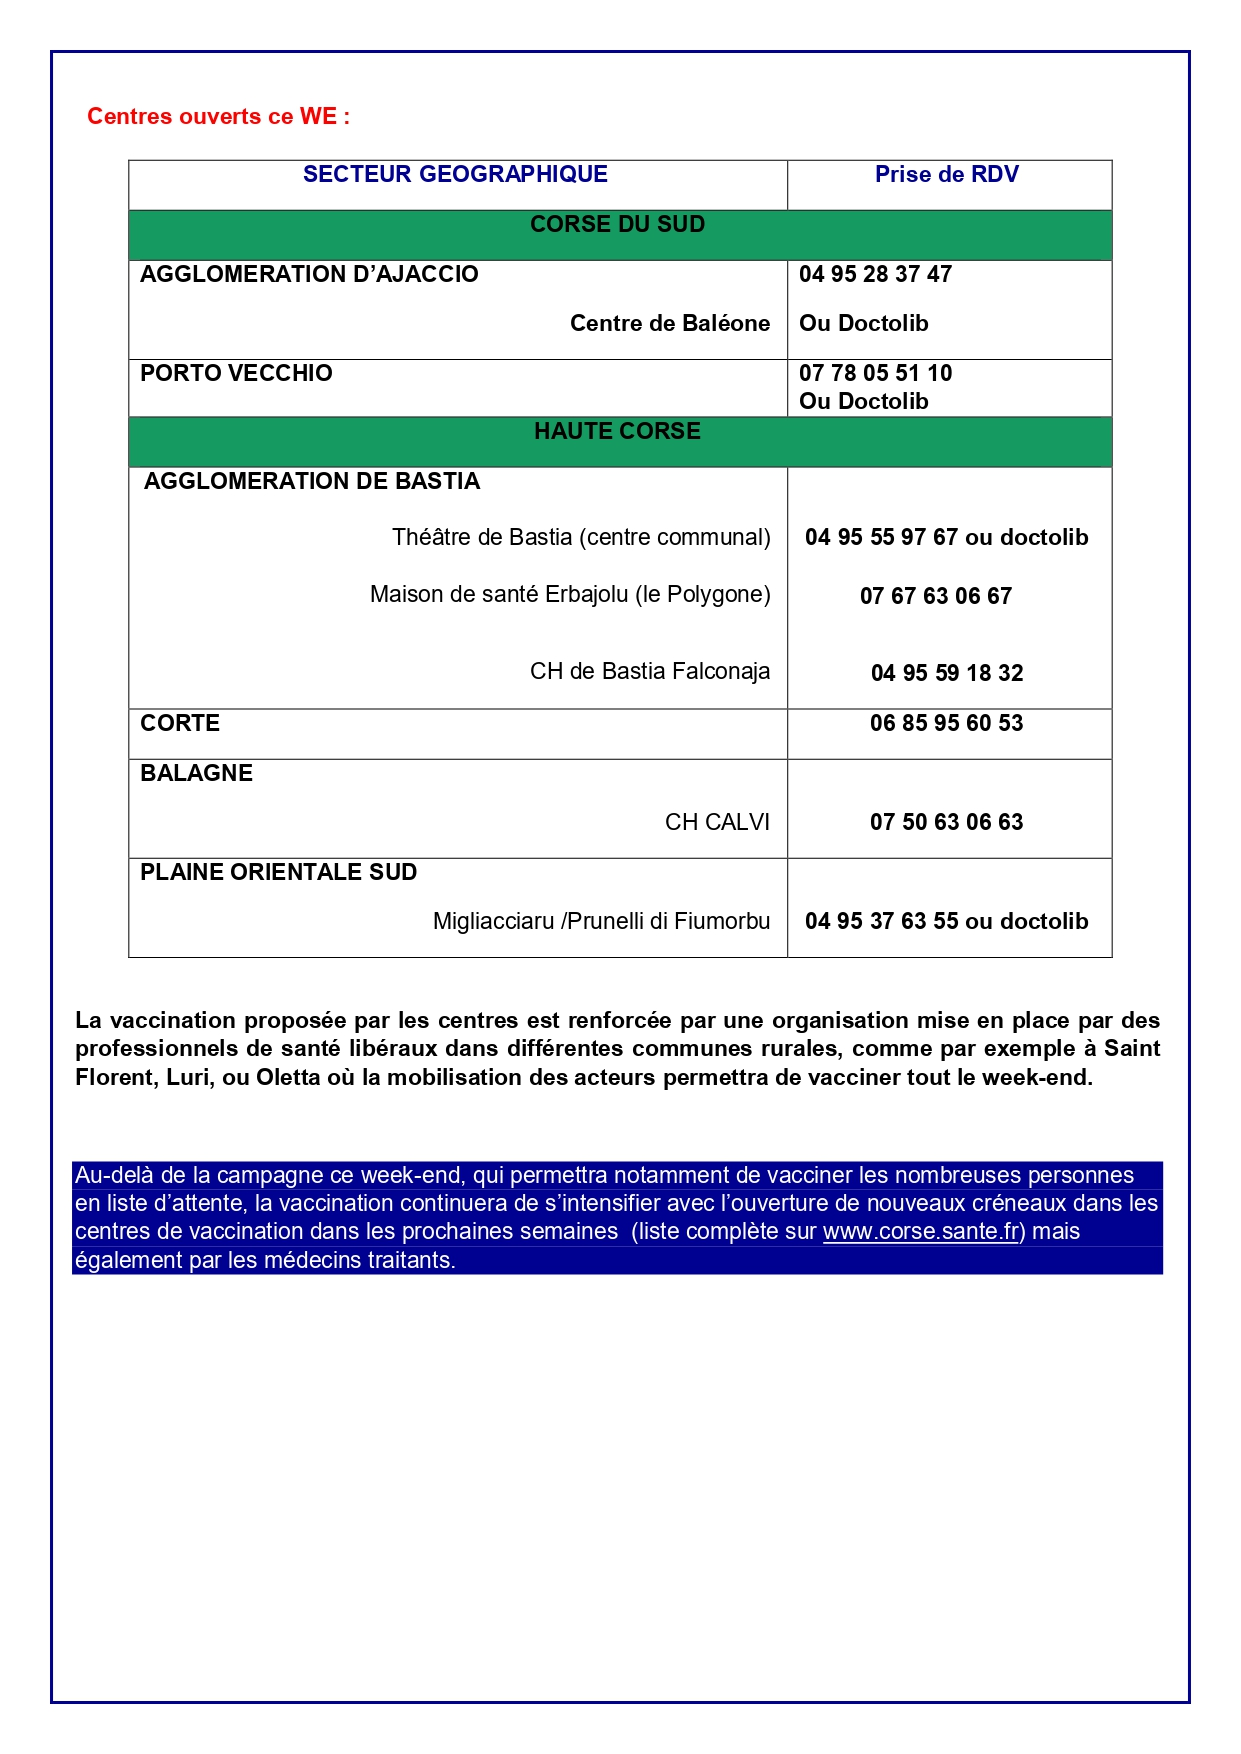 OPERATION VACCINATION CES 6 ET 7 MARS 2021